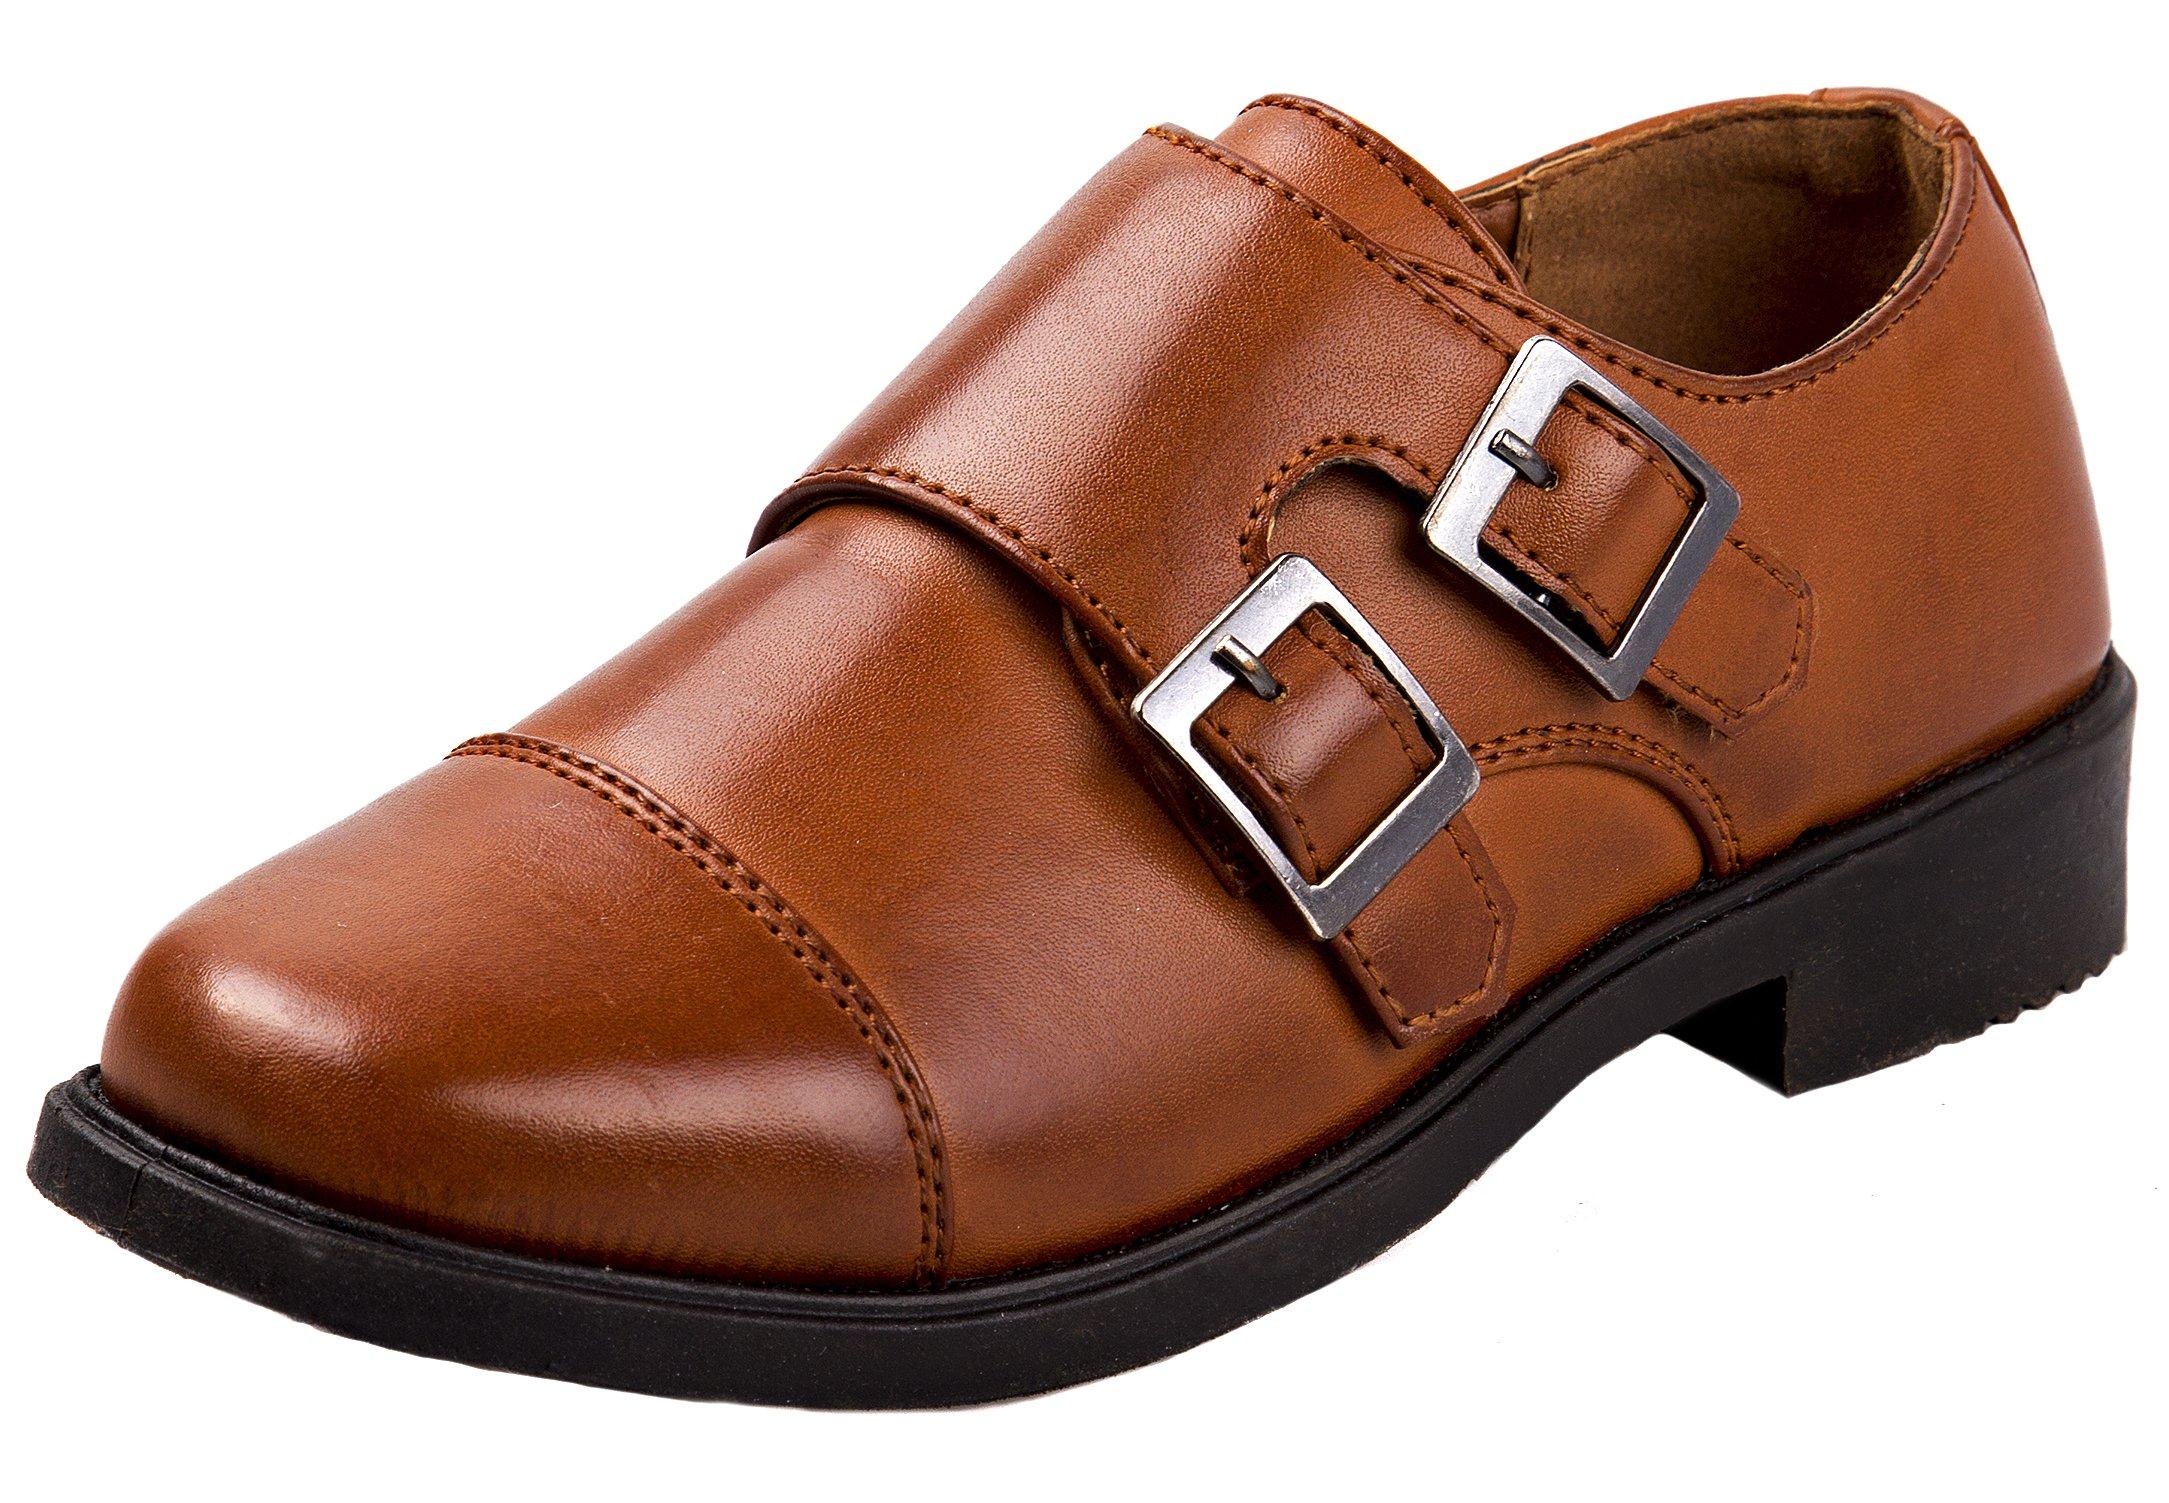 Josmo Boys Easy Strap Oxford Dress Shoe (Toddler/Little Kid/Big Kid), Brown, 11 US Toddler'